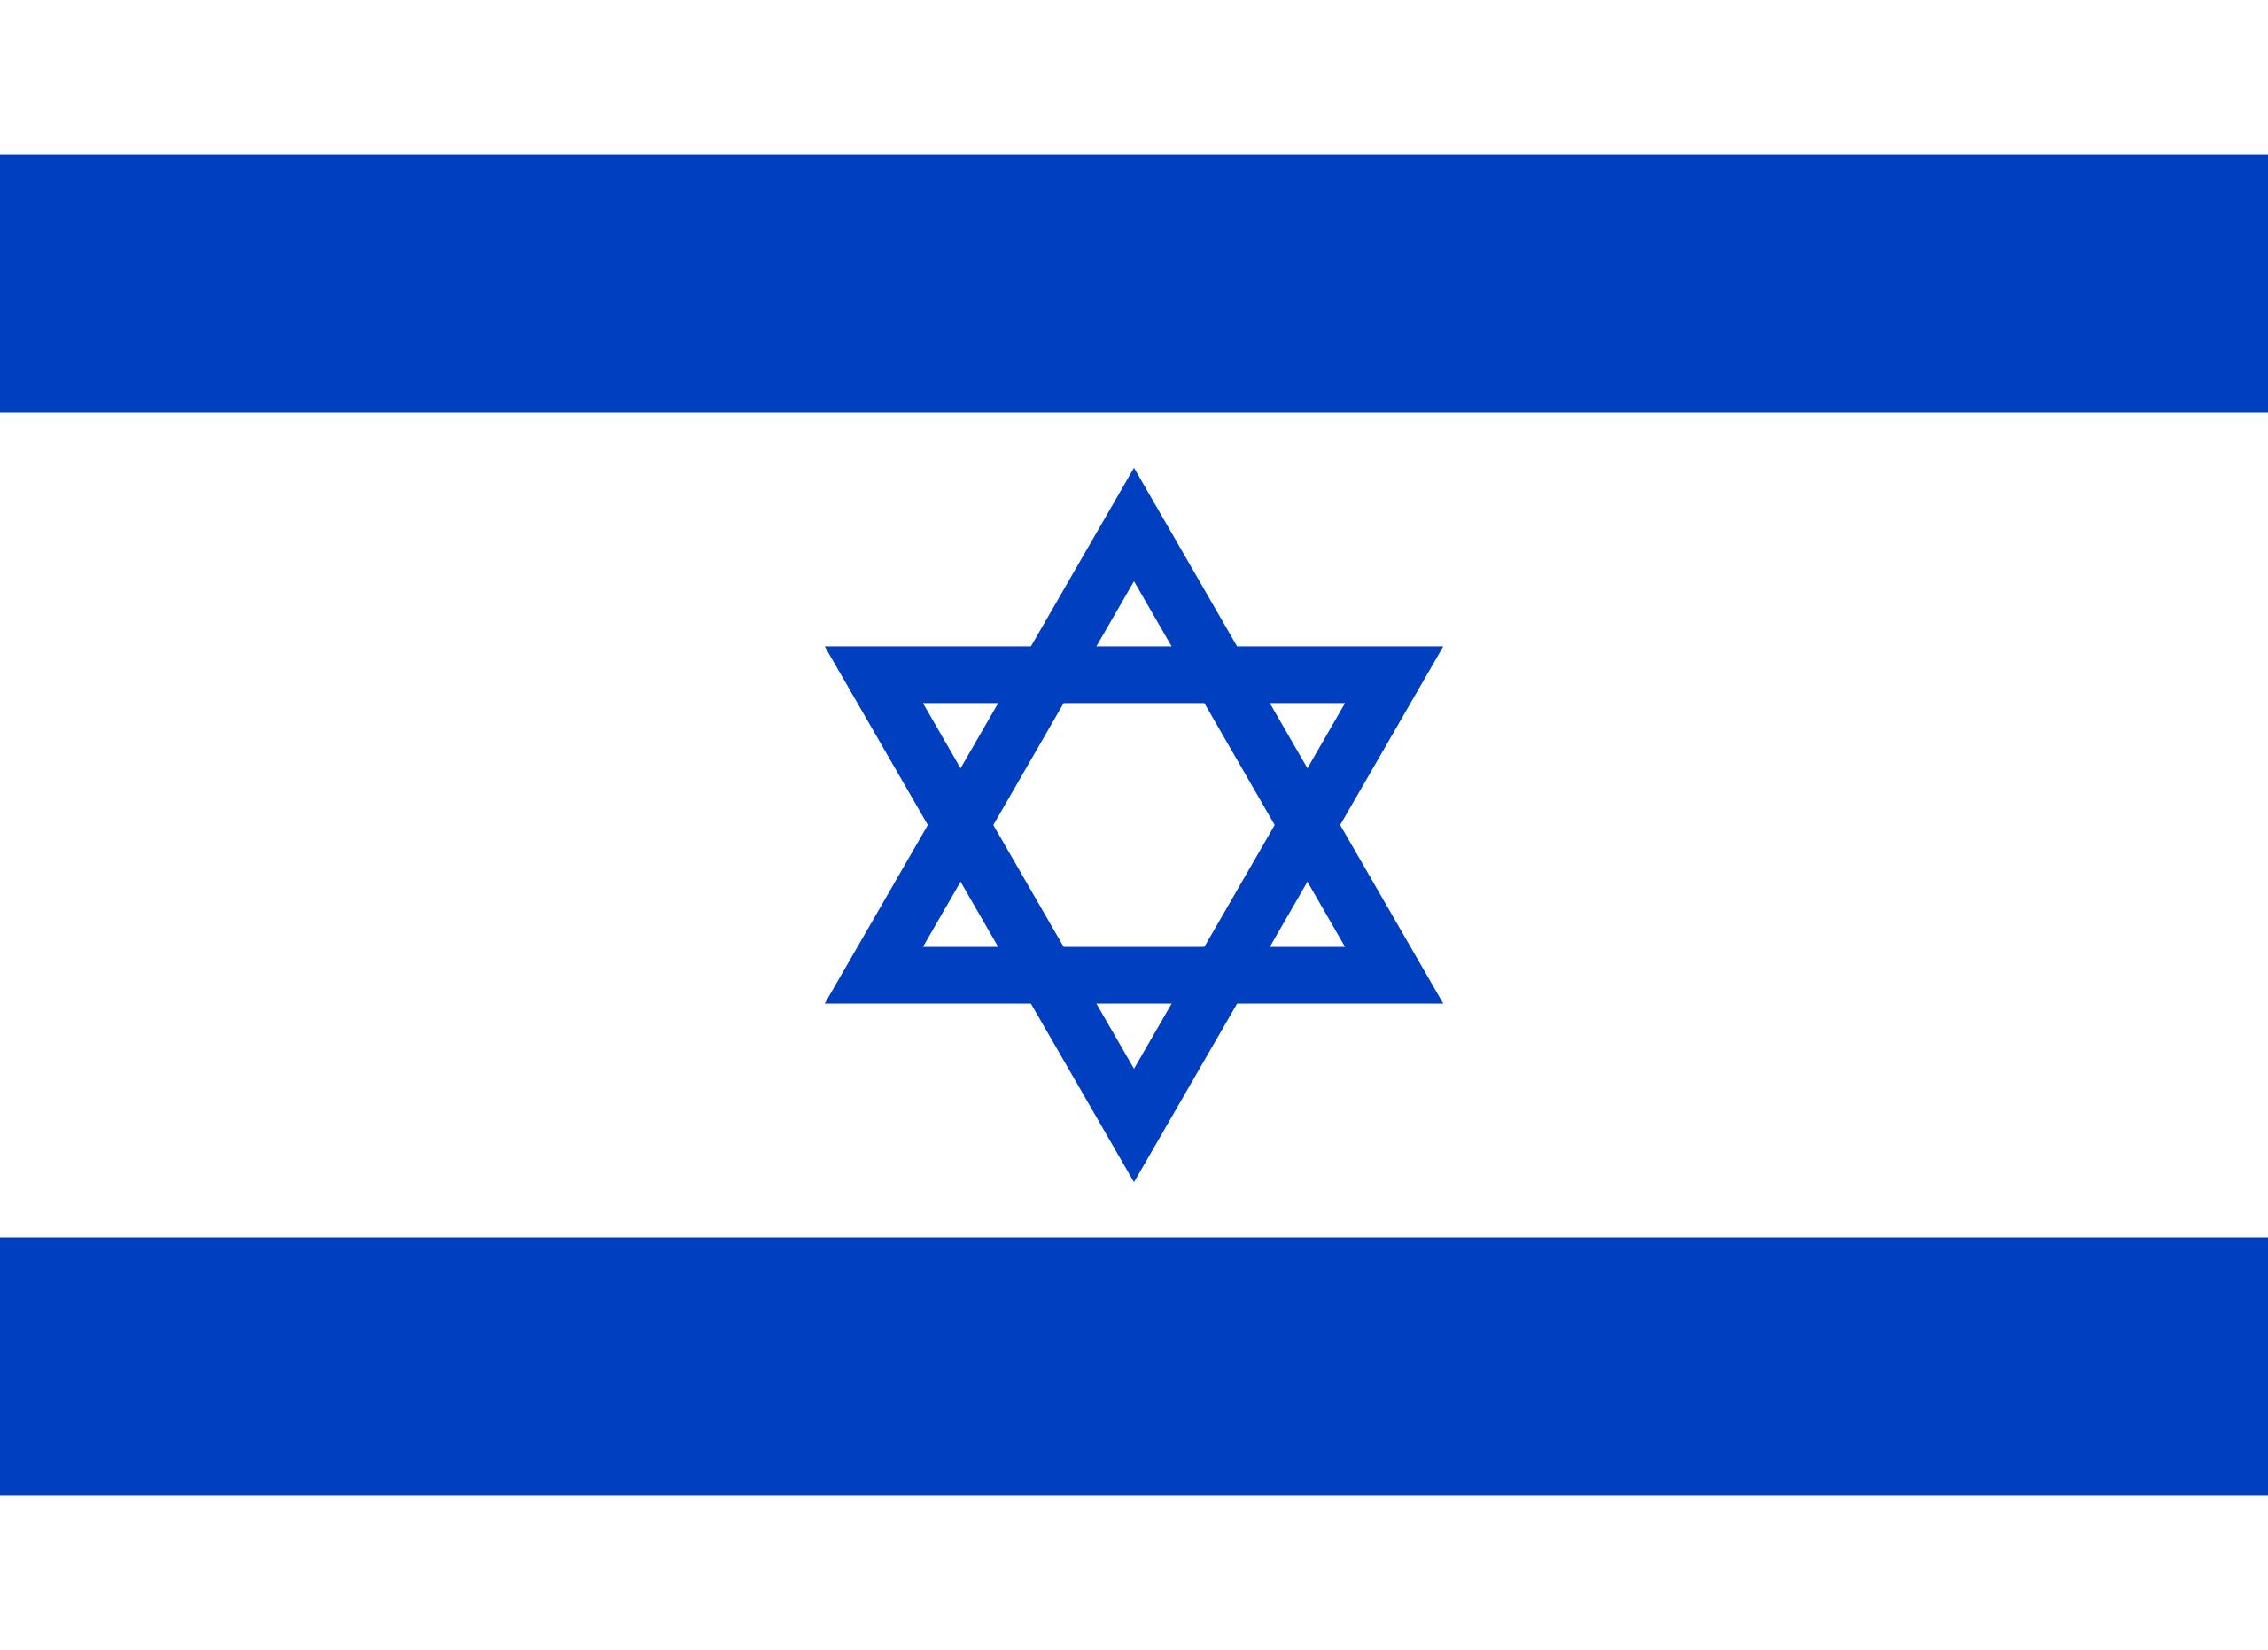 israel, χώρα, έμβλημα, λογότυπο, σύμβολο - Wallpapers HD - Professor-falken.com